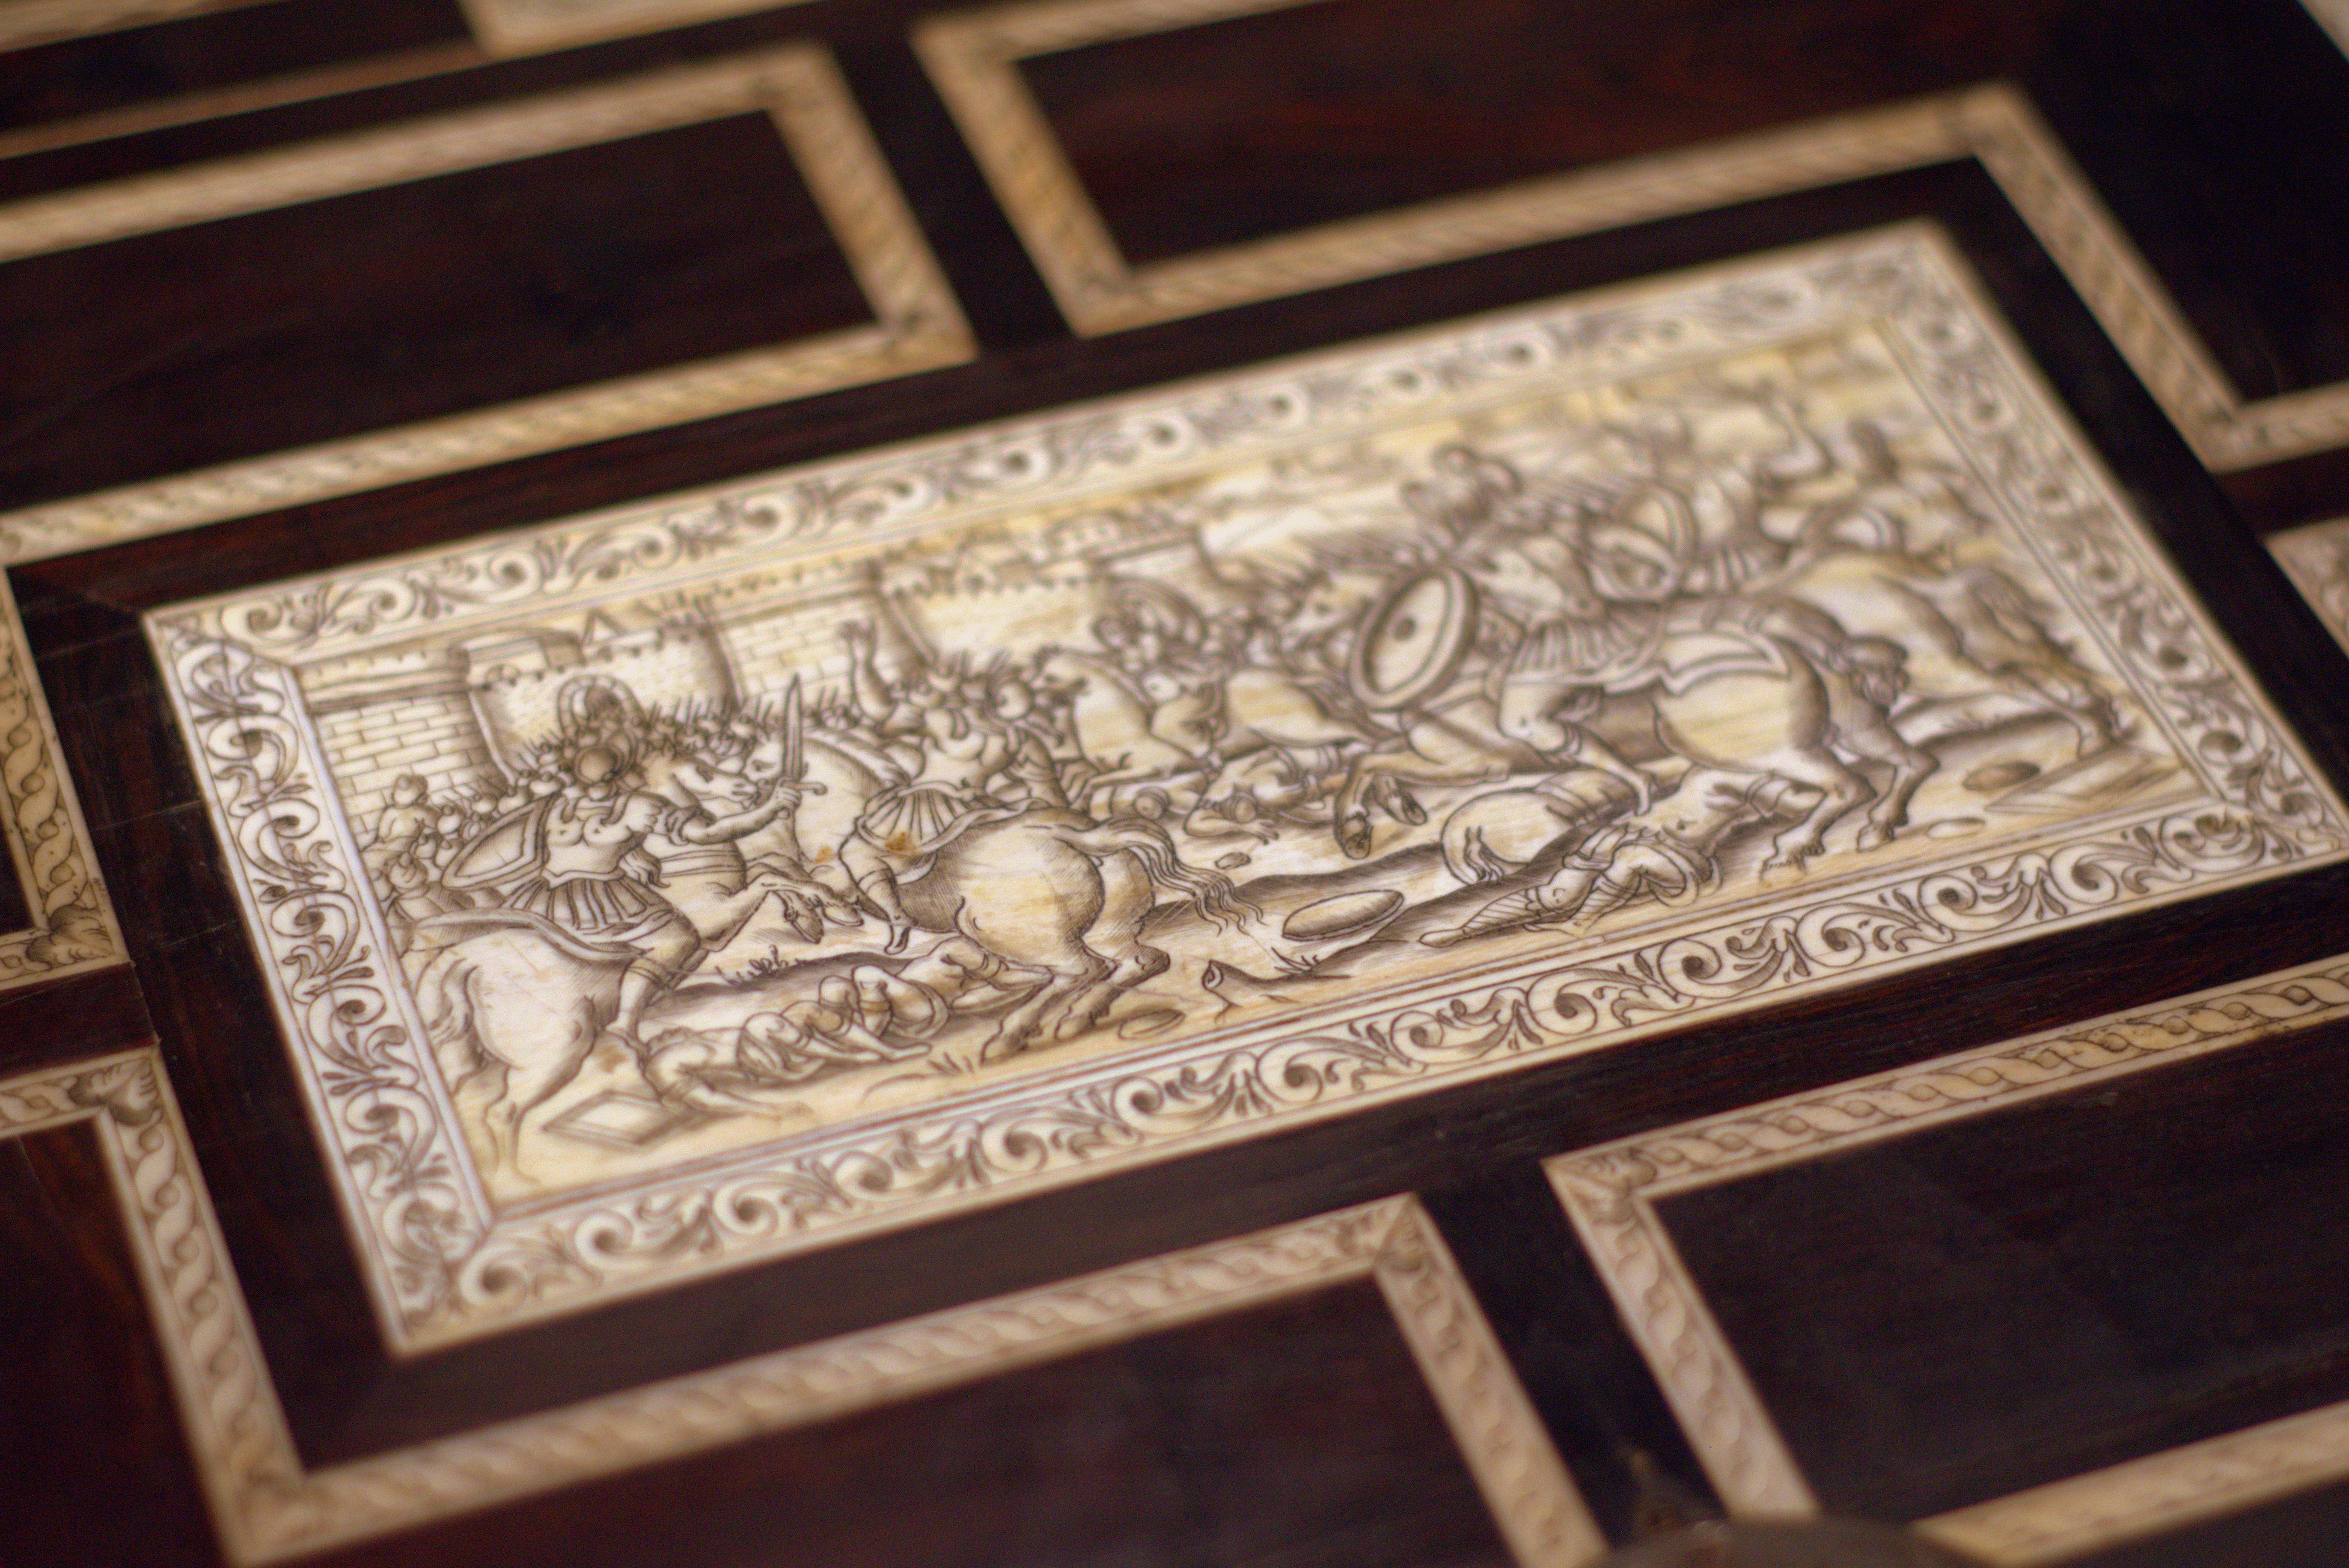 Free images : wood old monument geometric historic bone design